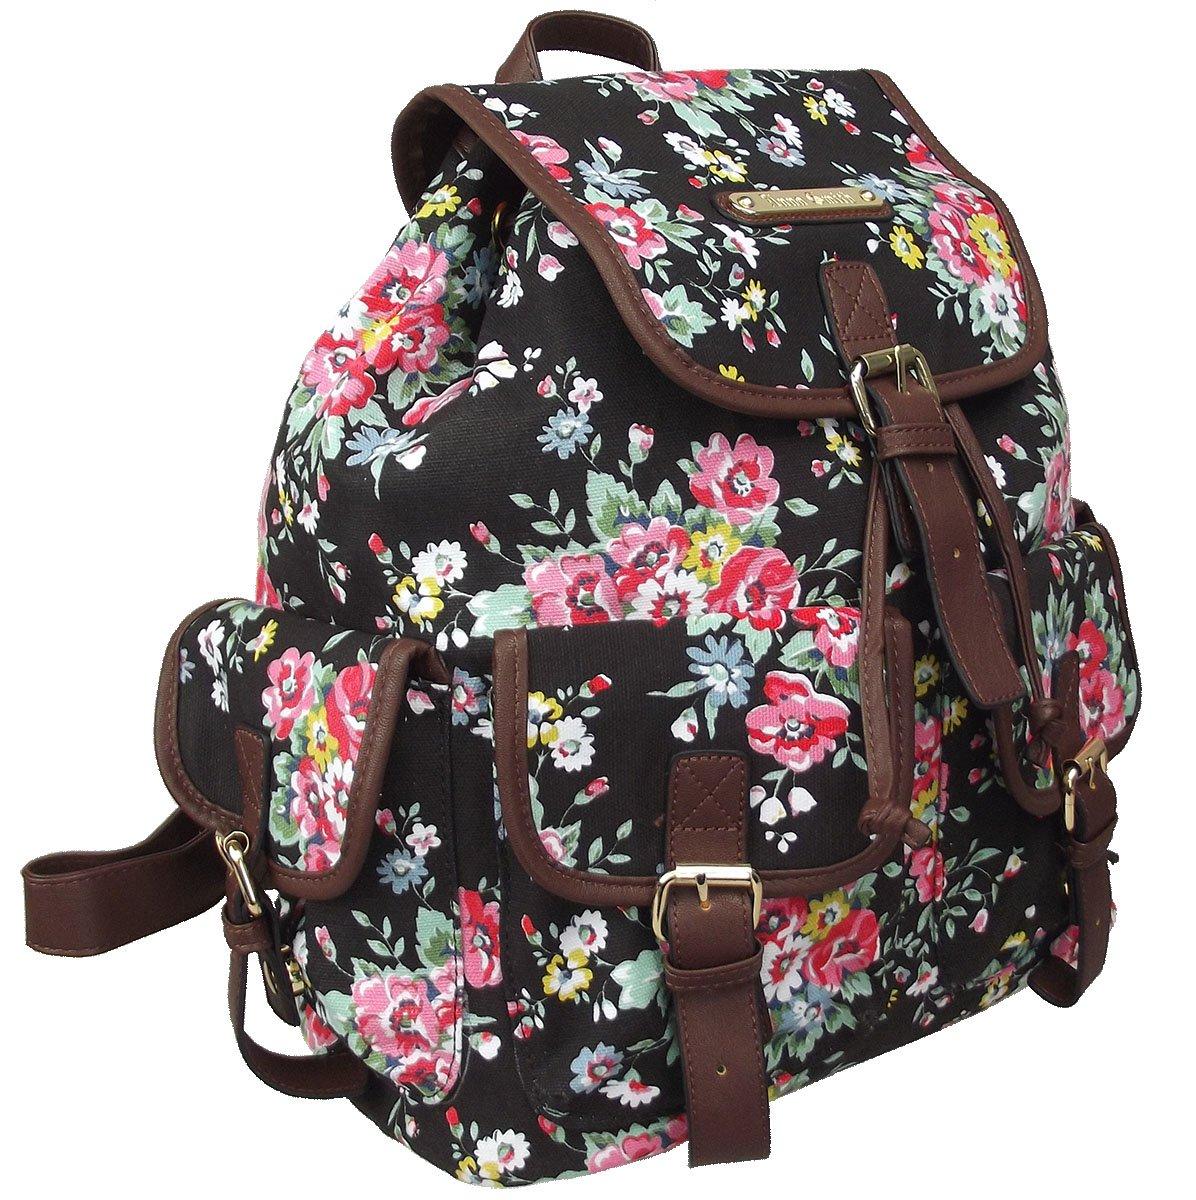 28846ba7e6 Anna Smith (By LYDC) Floral Frances Backpack   Ladies Girls Designer Flower  Print Canvas Rucksack (Black)  Amazon.co.uk  Luggage